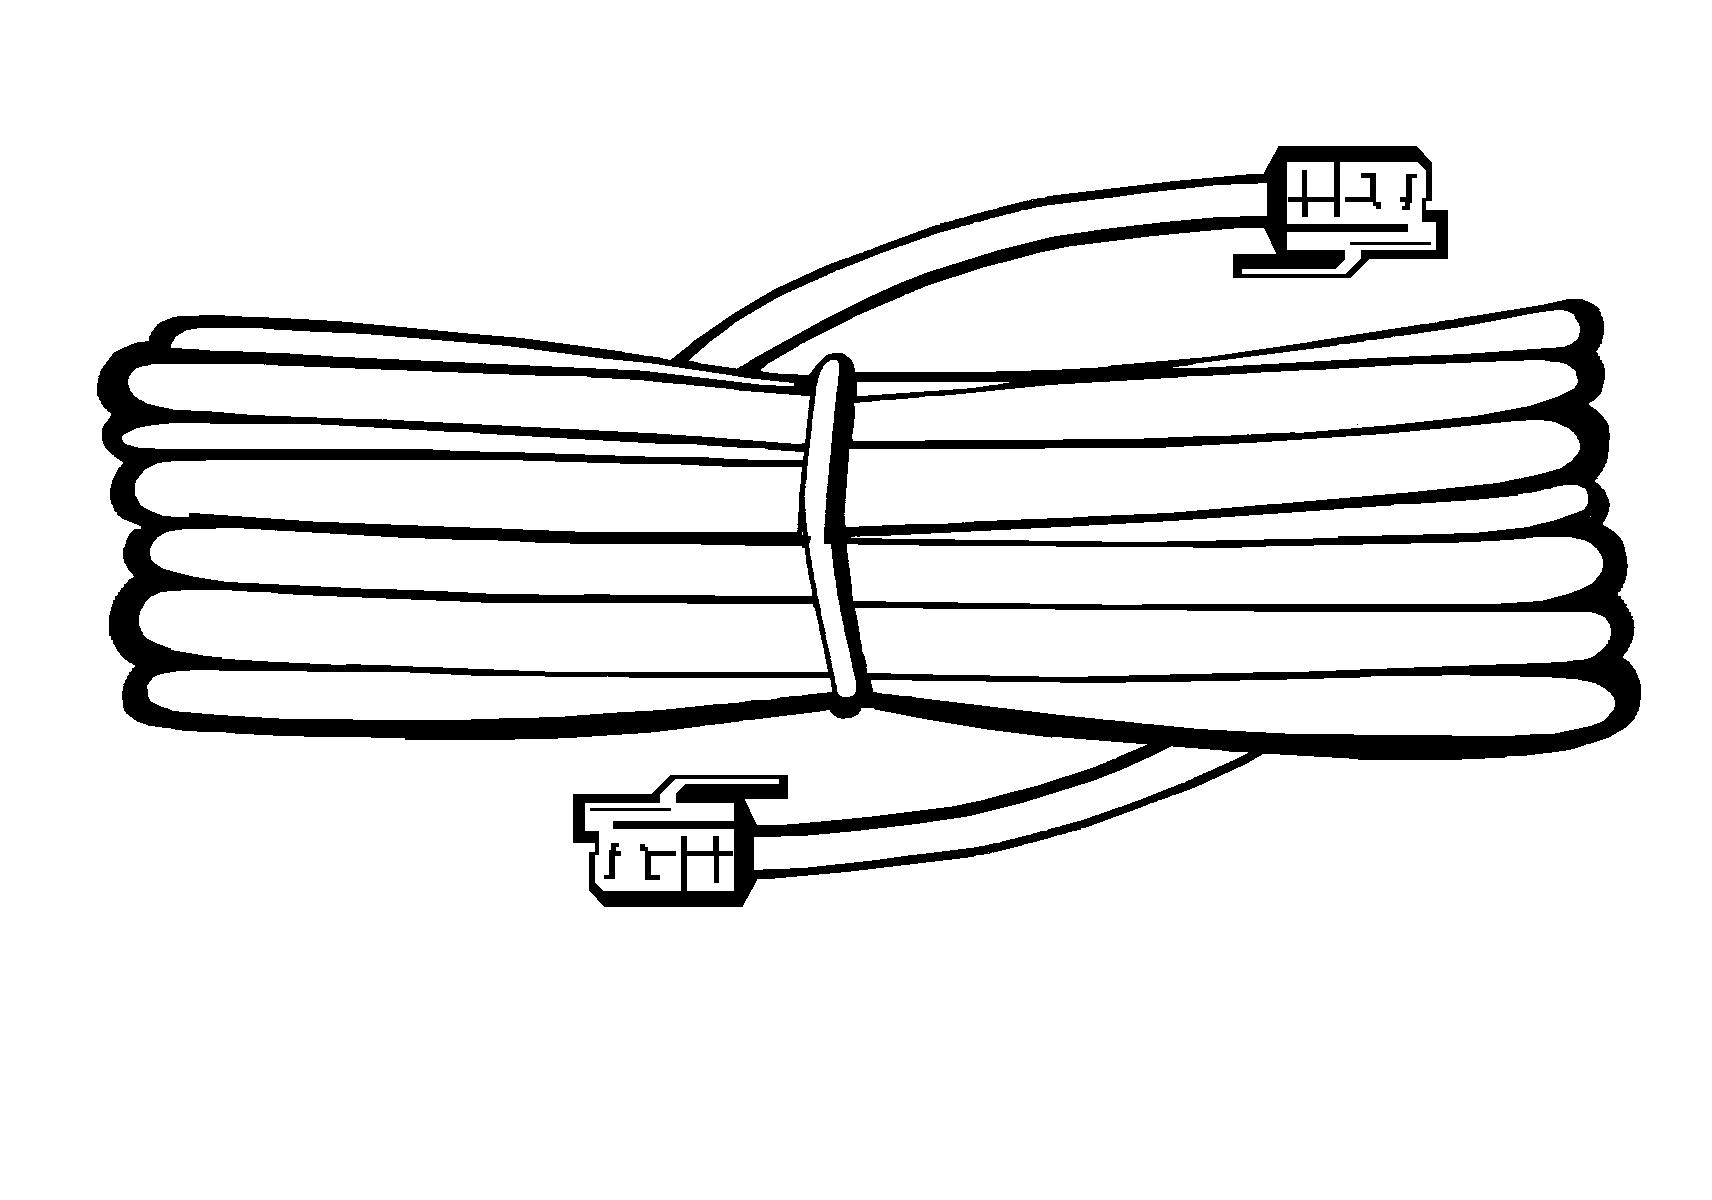 15 Modular Replacement Cord